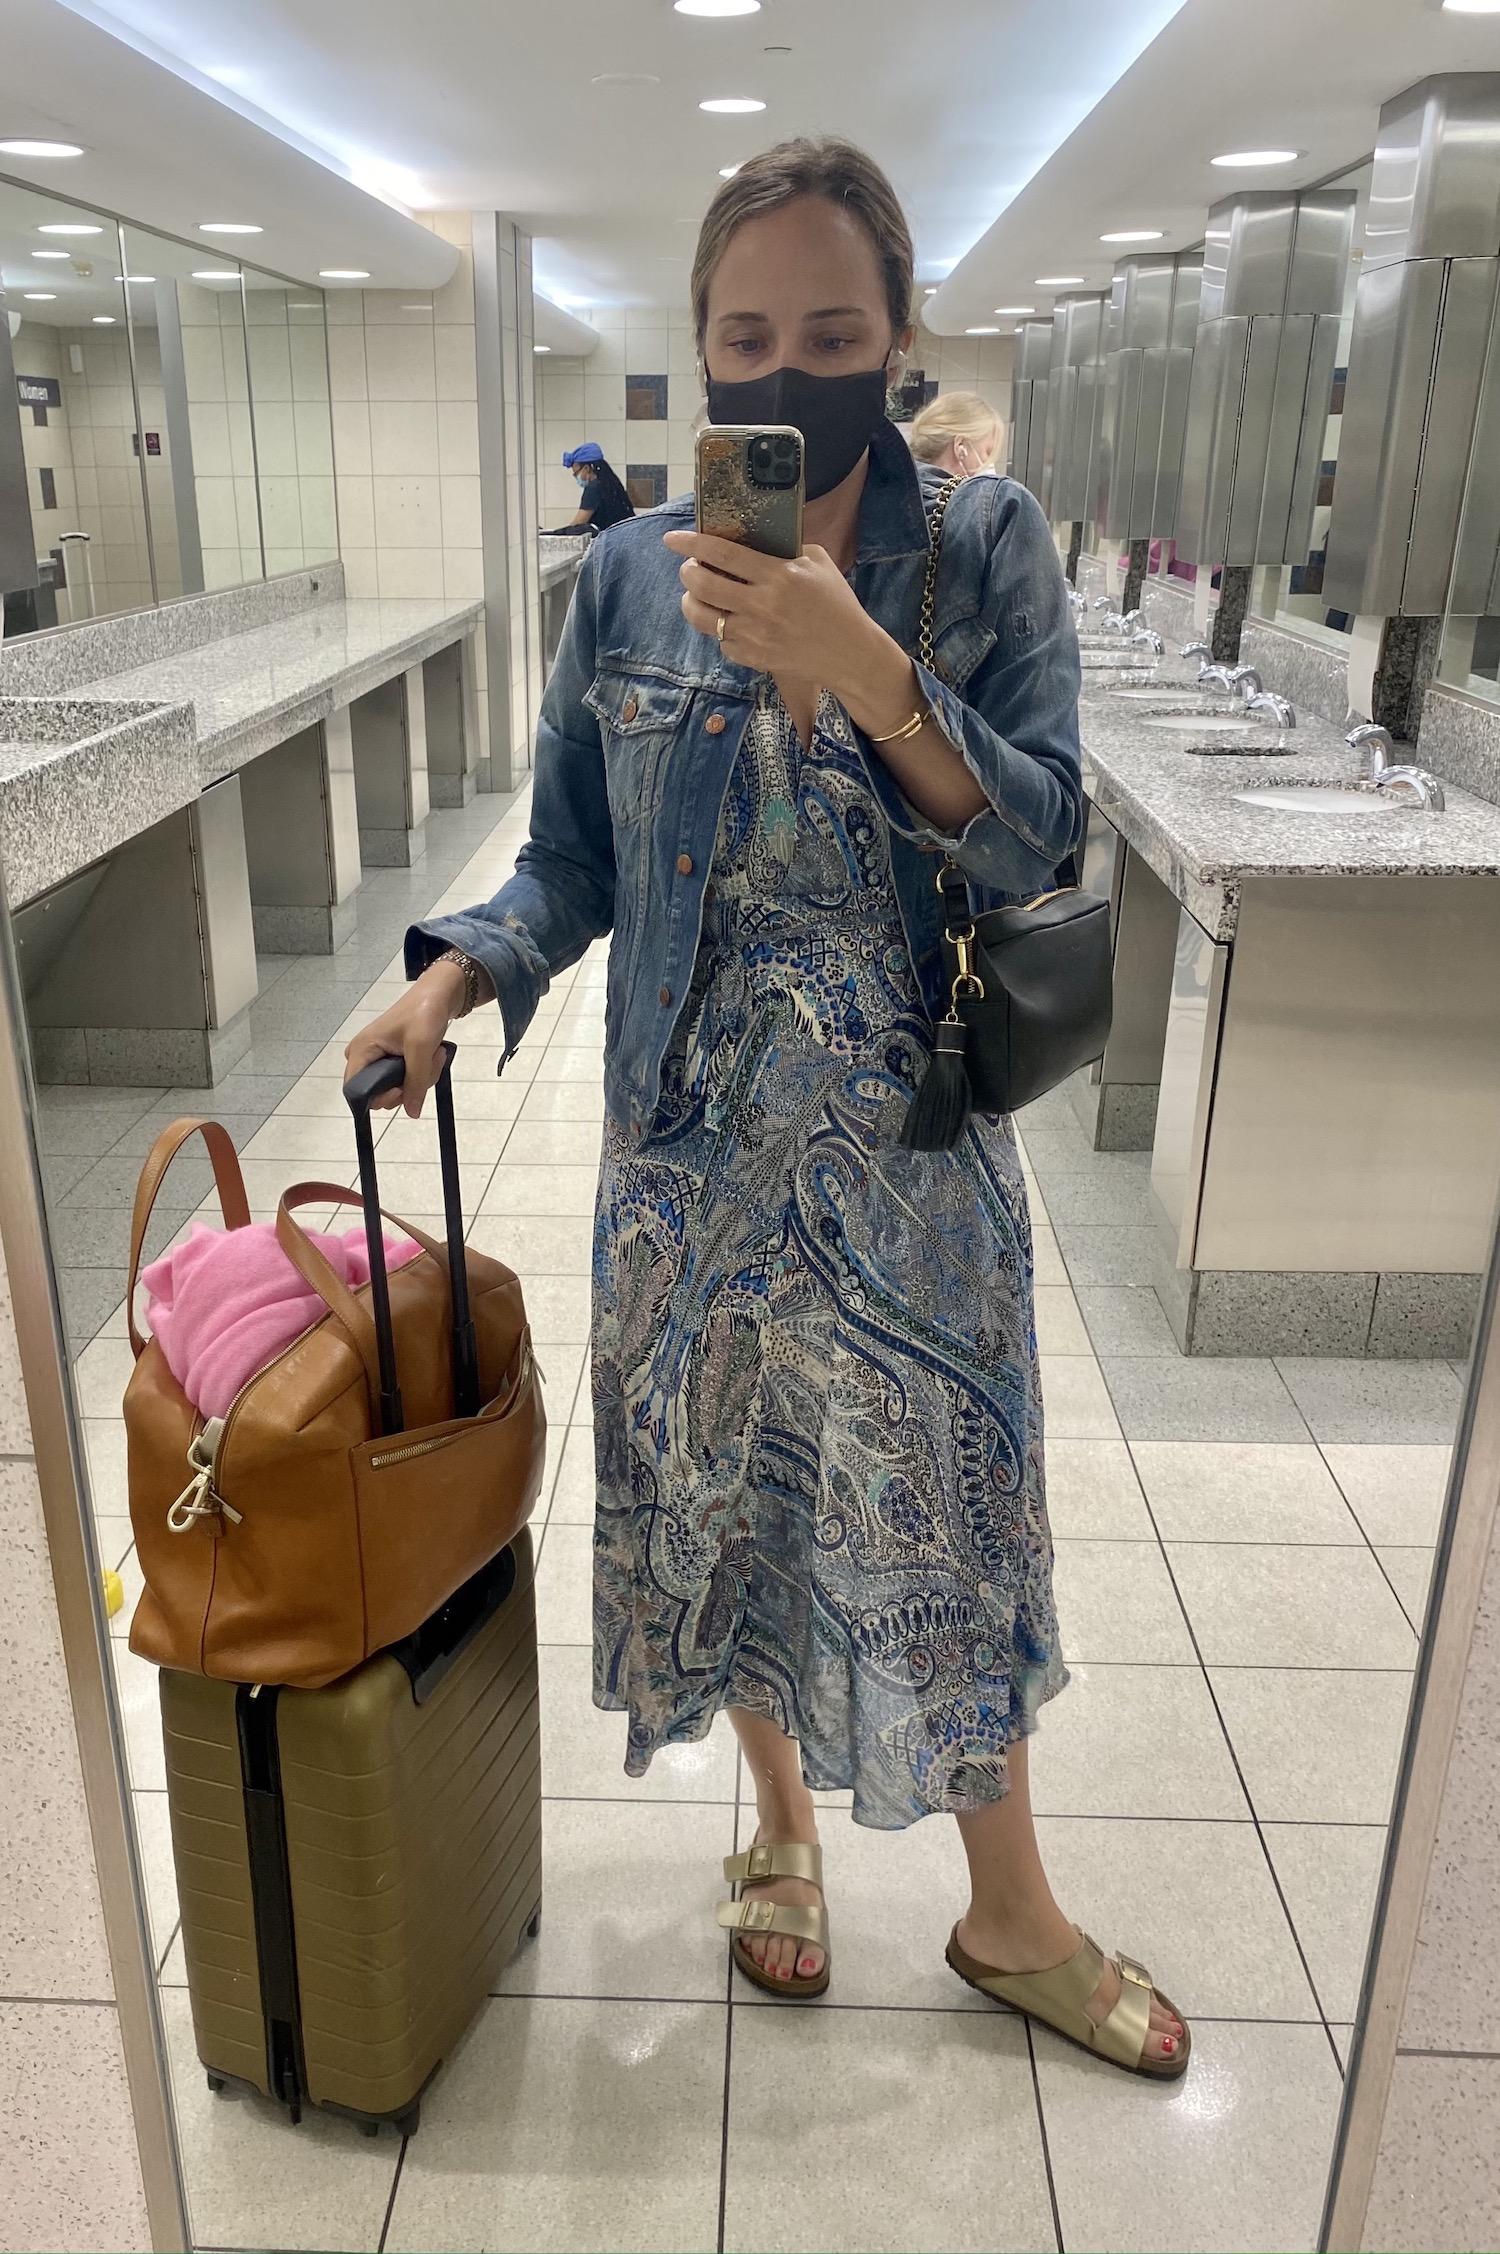 prettiest paisley dress from Ba&sh | What I Wore Last Week 6.2.21